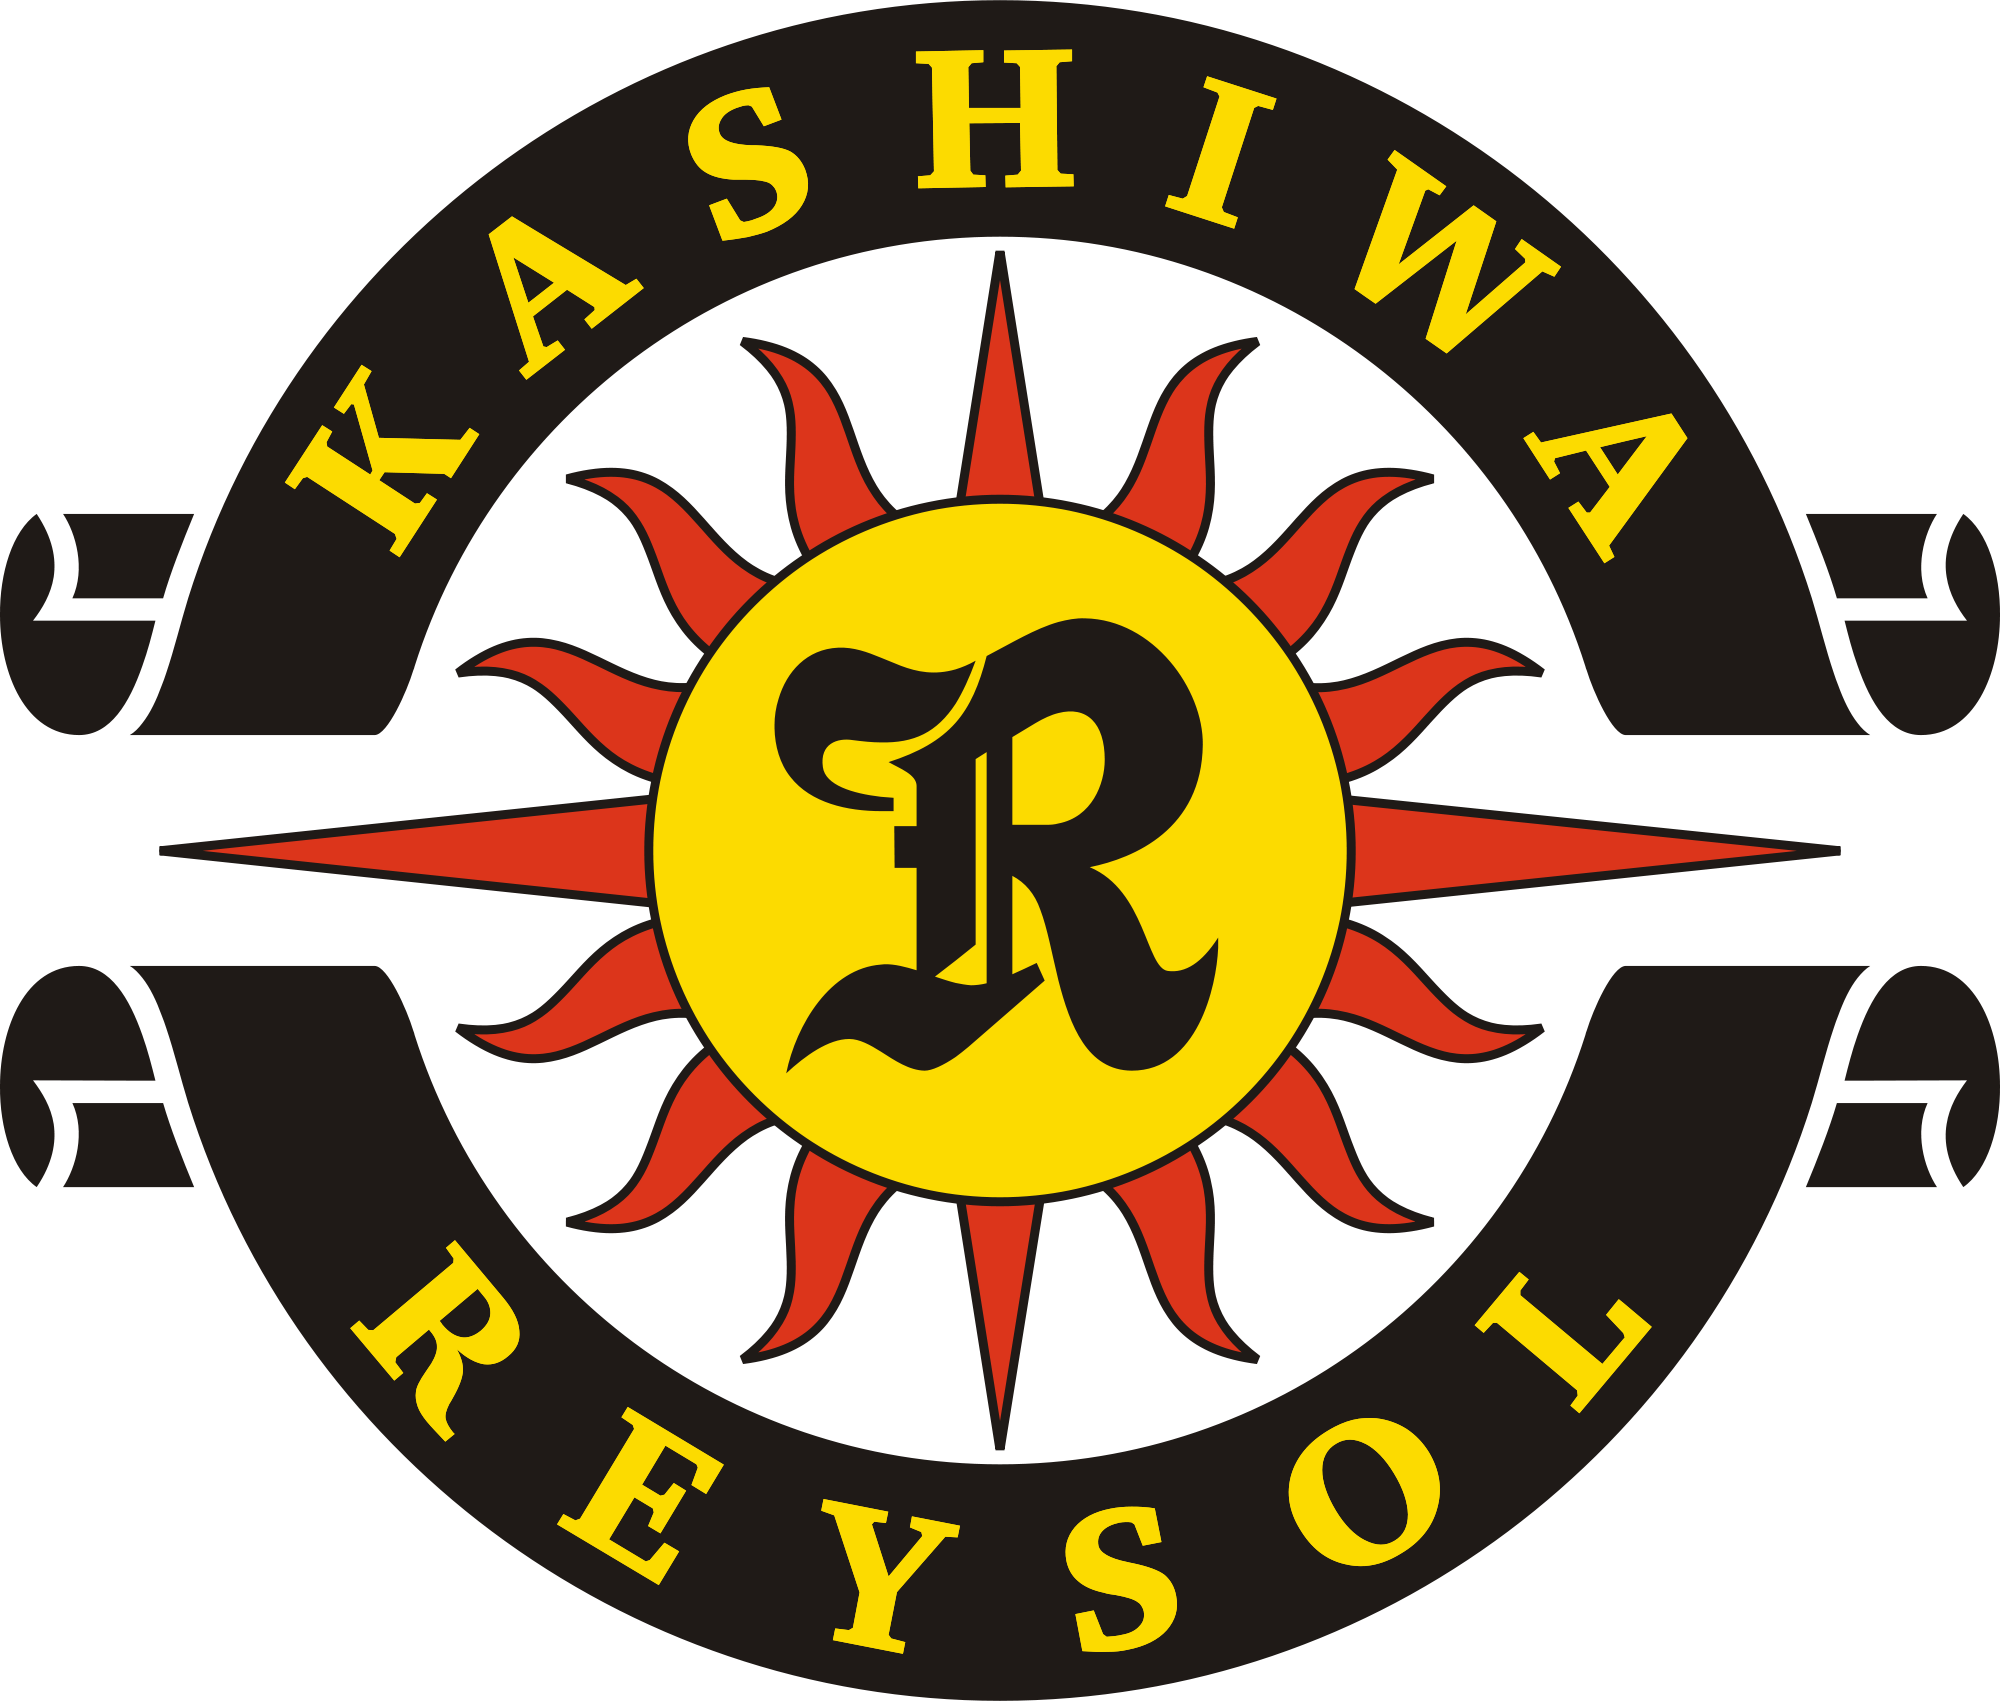 Kashiwa Reysol Japan Kashiwa reysol, Soccer logo